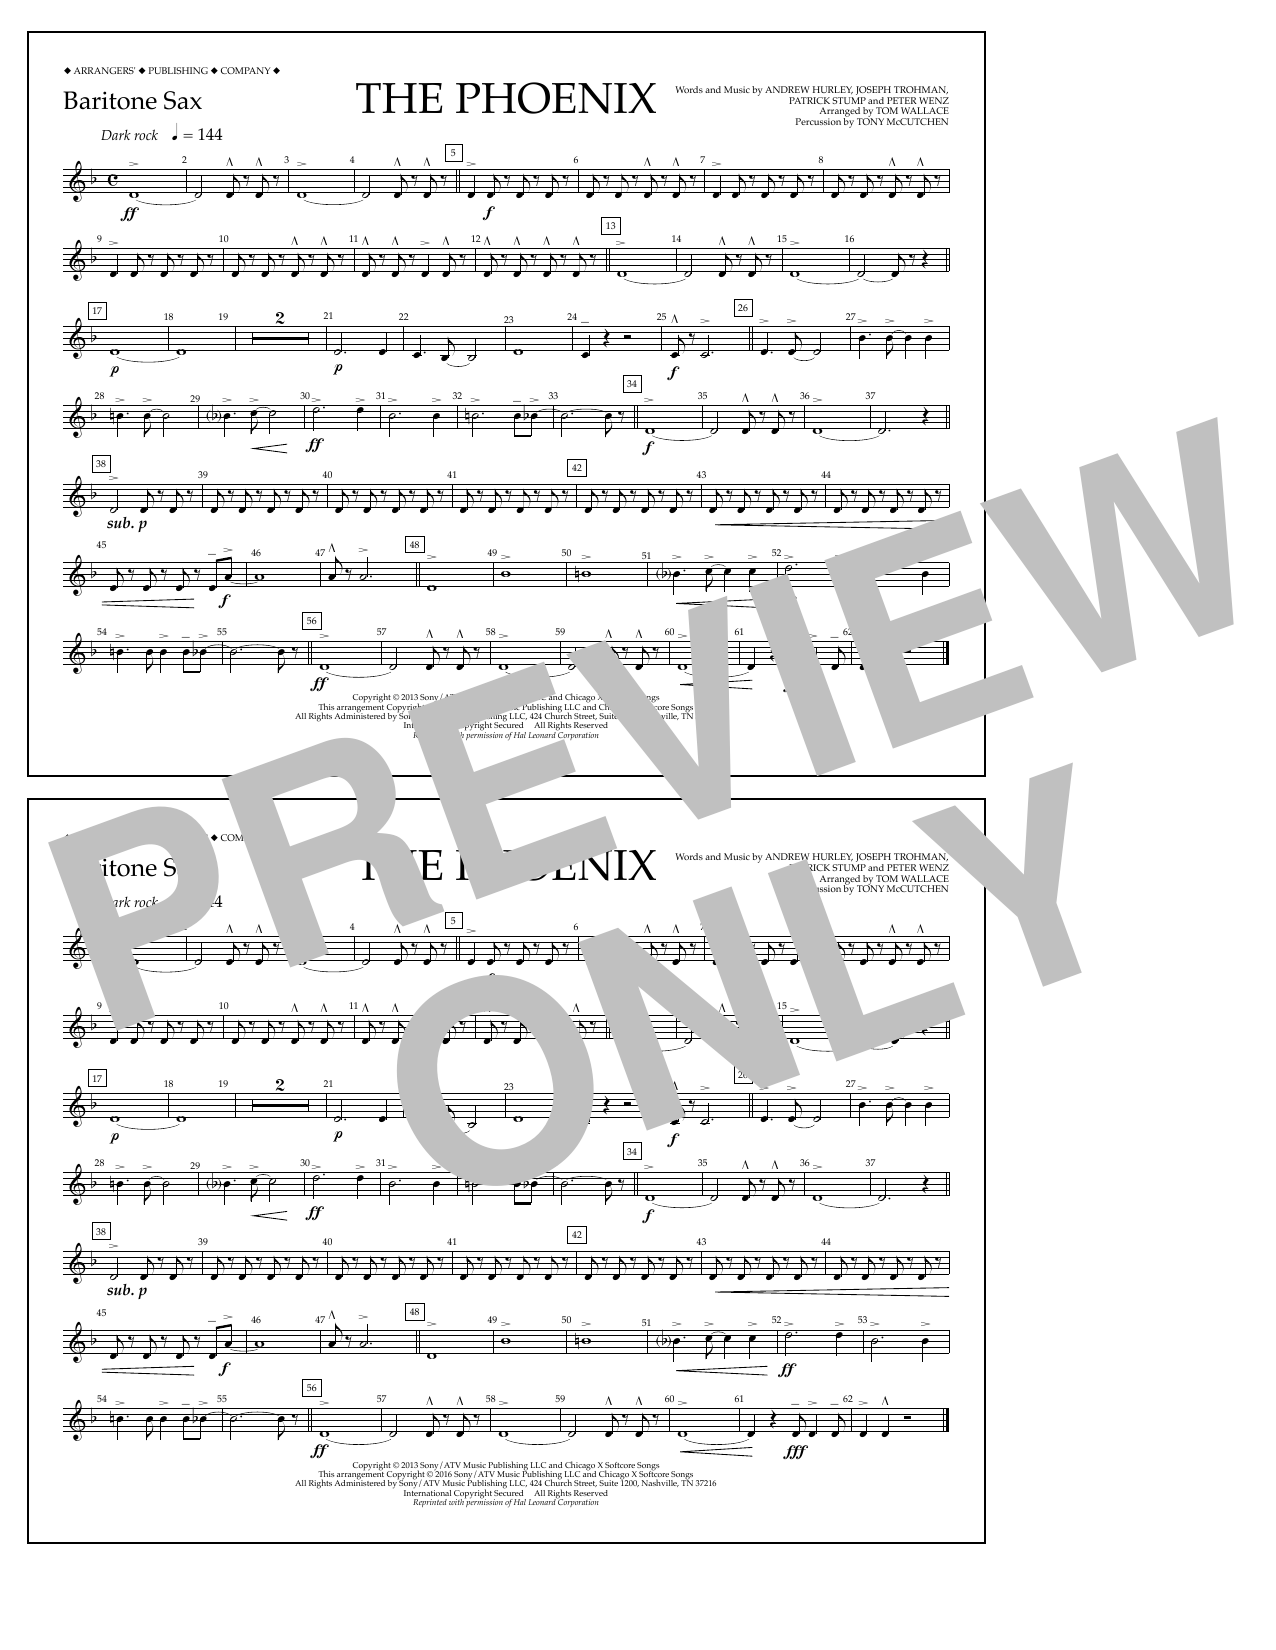 Fall Out Boy - The Phoenix - Baritone Sax